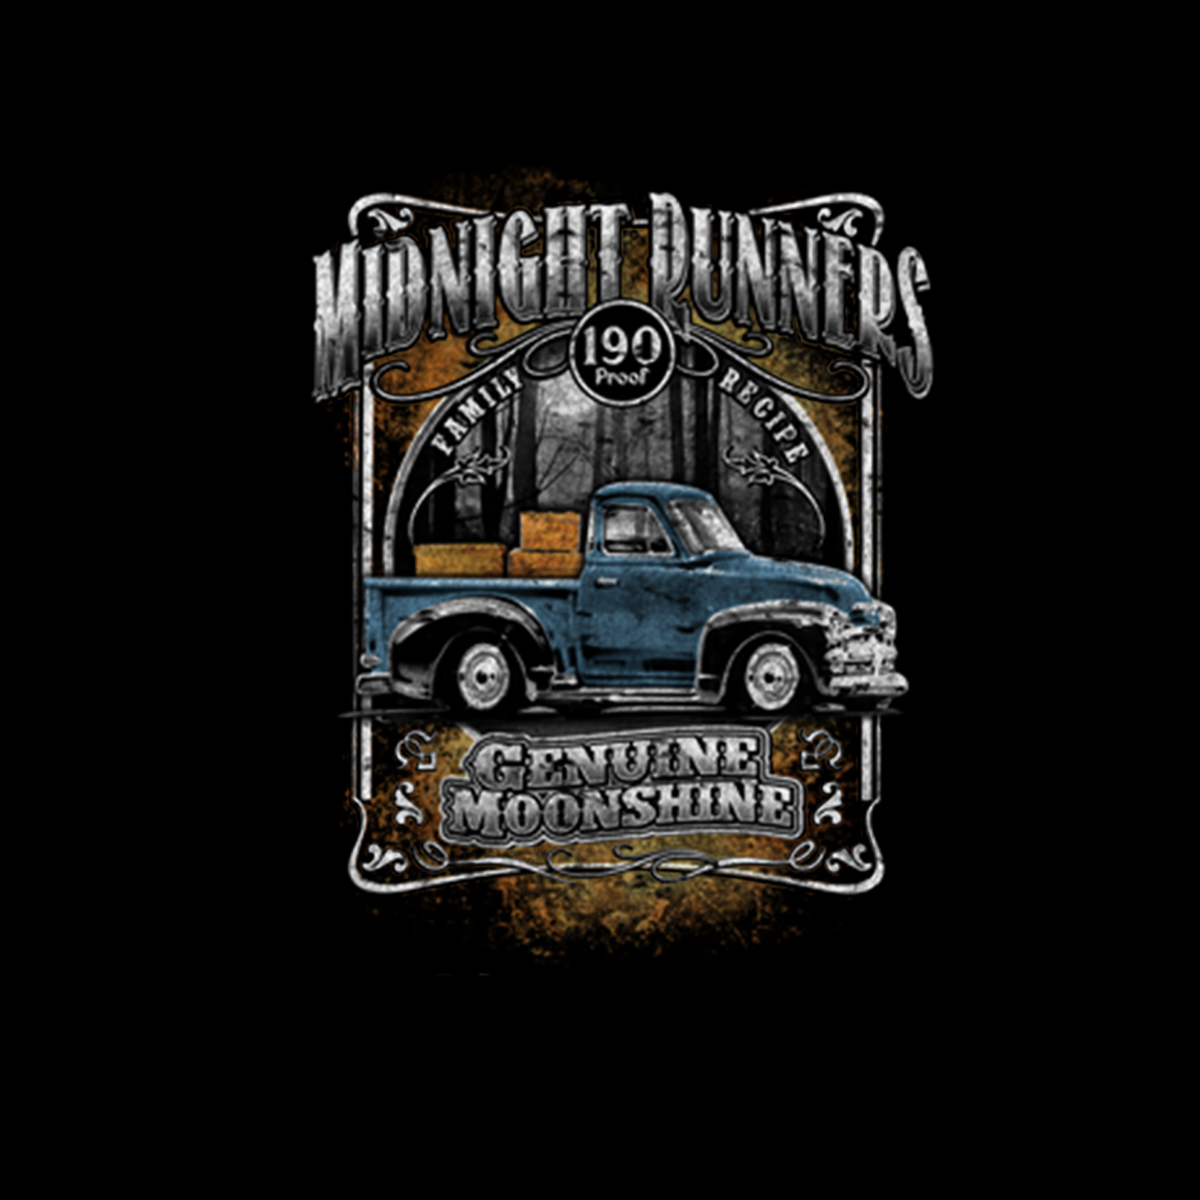 thumbnail 3 - Moonshine Midnight Runners Men T-shirt XS-5XL New